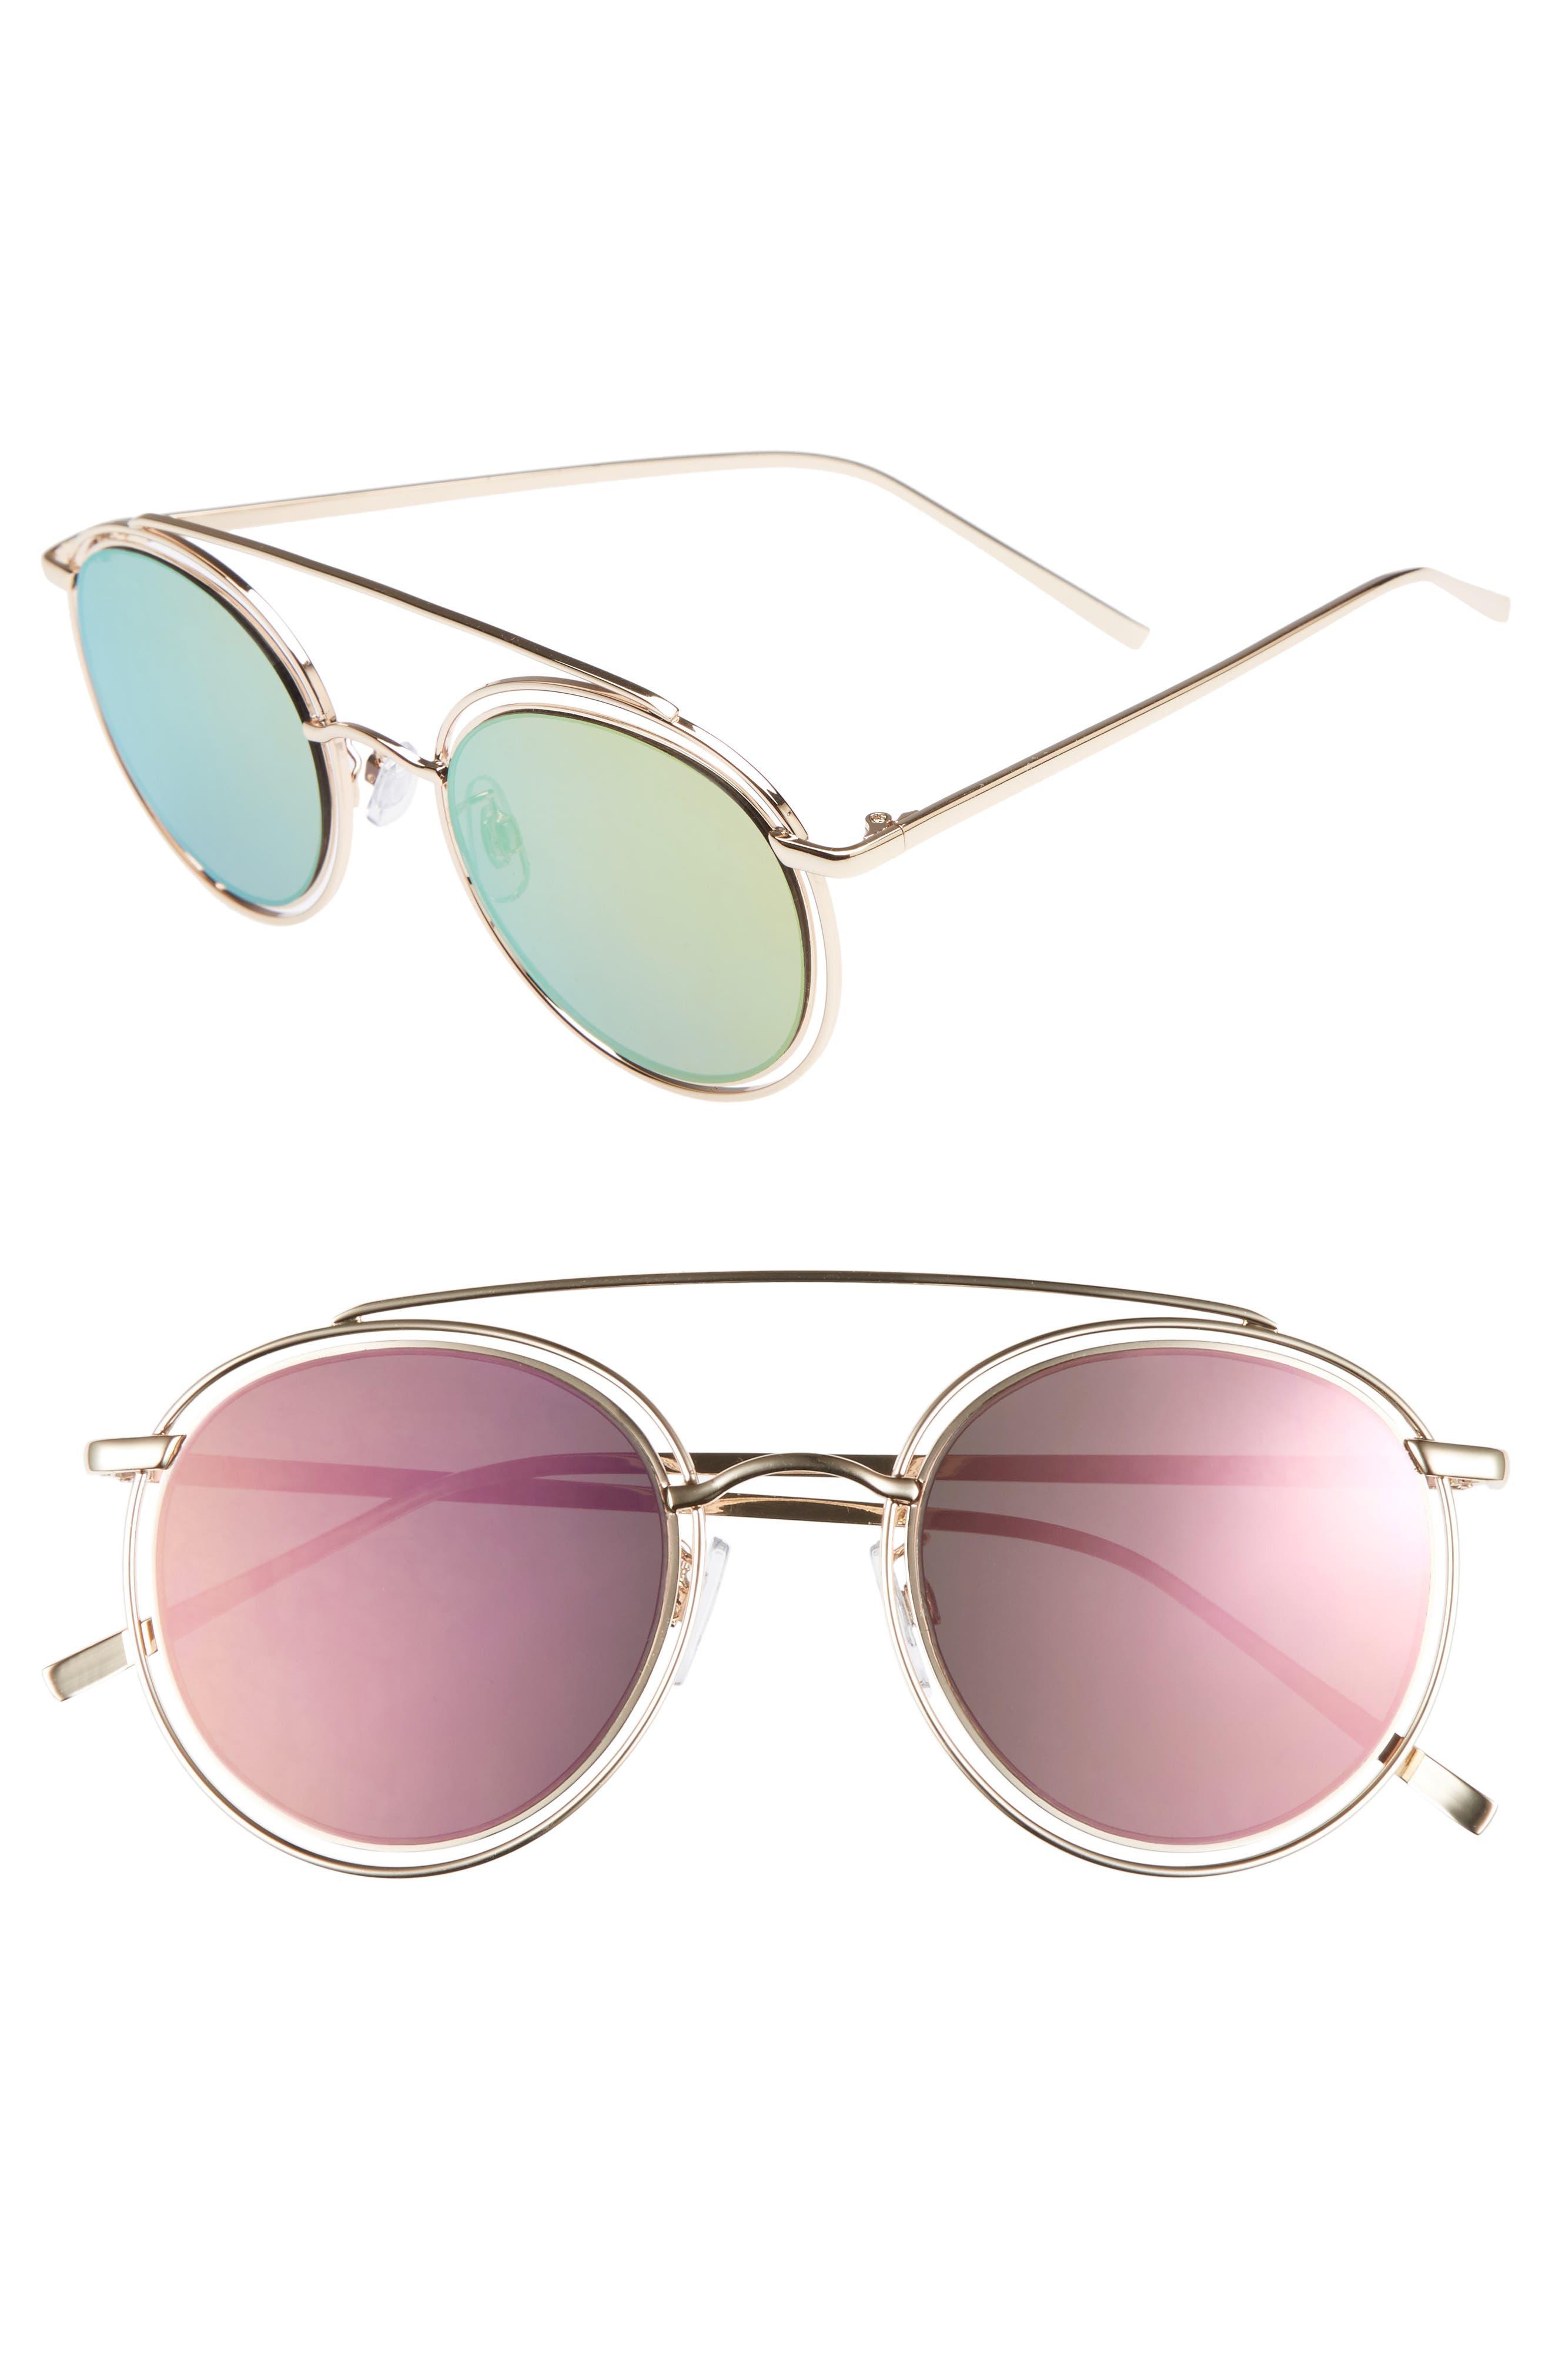 50mm Browbar Sunglasses,                         Main,                         color, Gold/ Pink